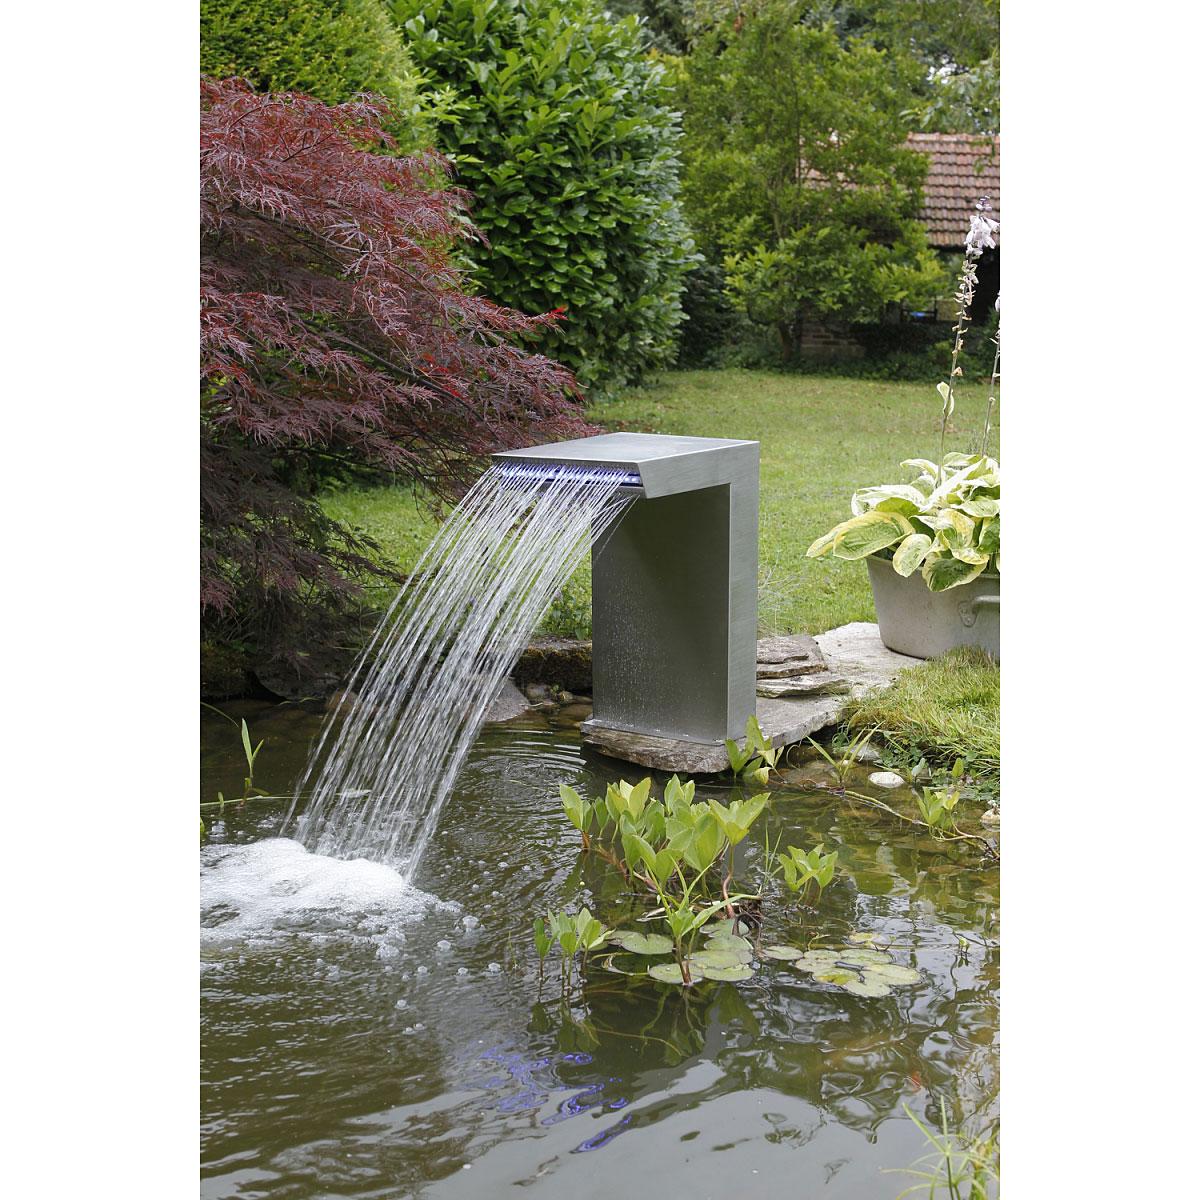 "Gartendekoration - Wasserfall""Straight"" inkl. LED Beleuchtung  - Onlineshop Hellweg"